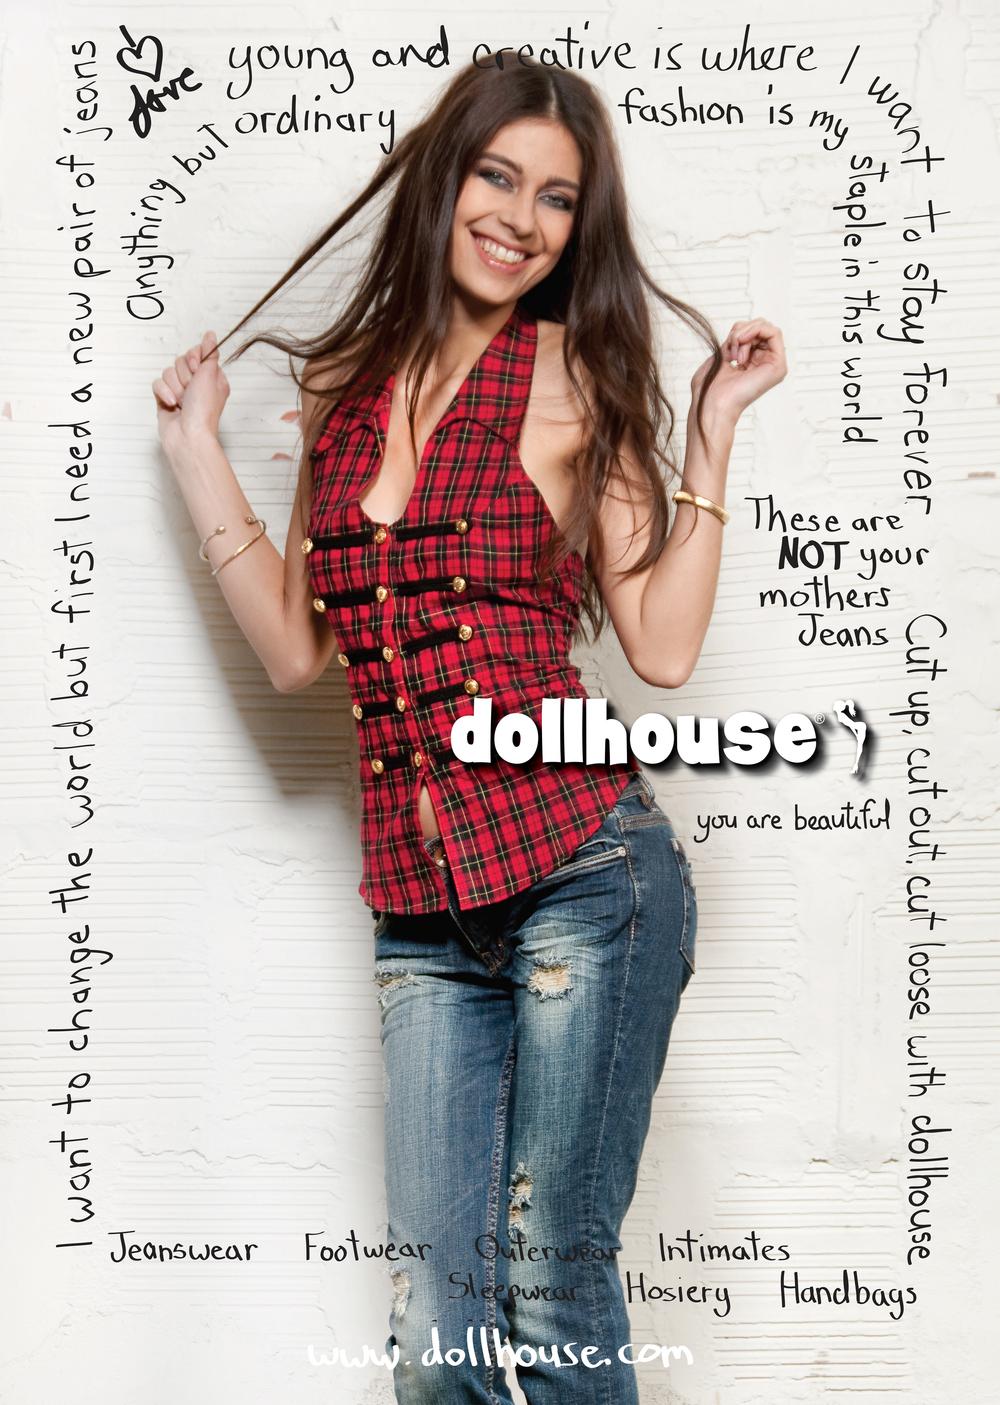 dollhouse-poster-2.jpg